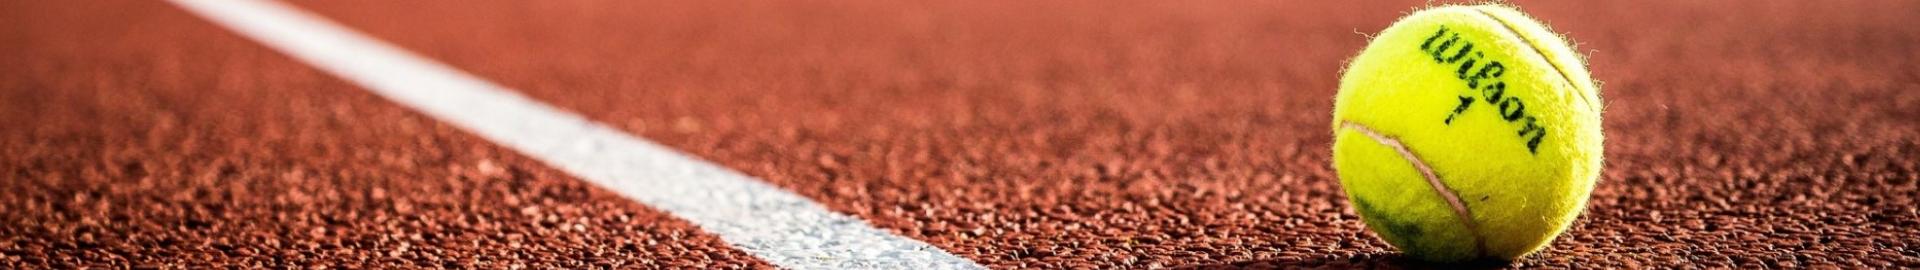 Racchette da Tennis Head/Babolat/Dunlop/Wilson | Tennis Zone Siena